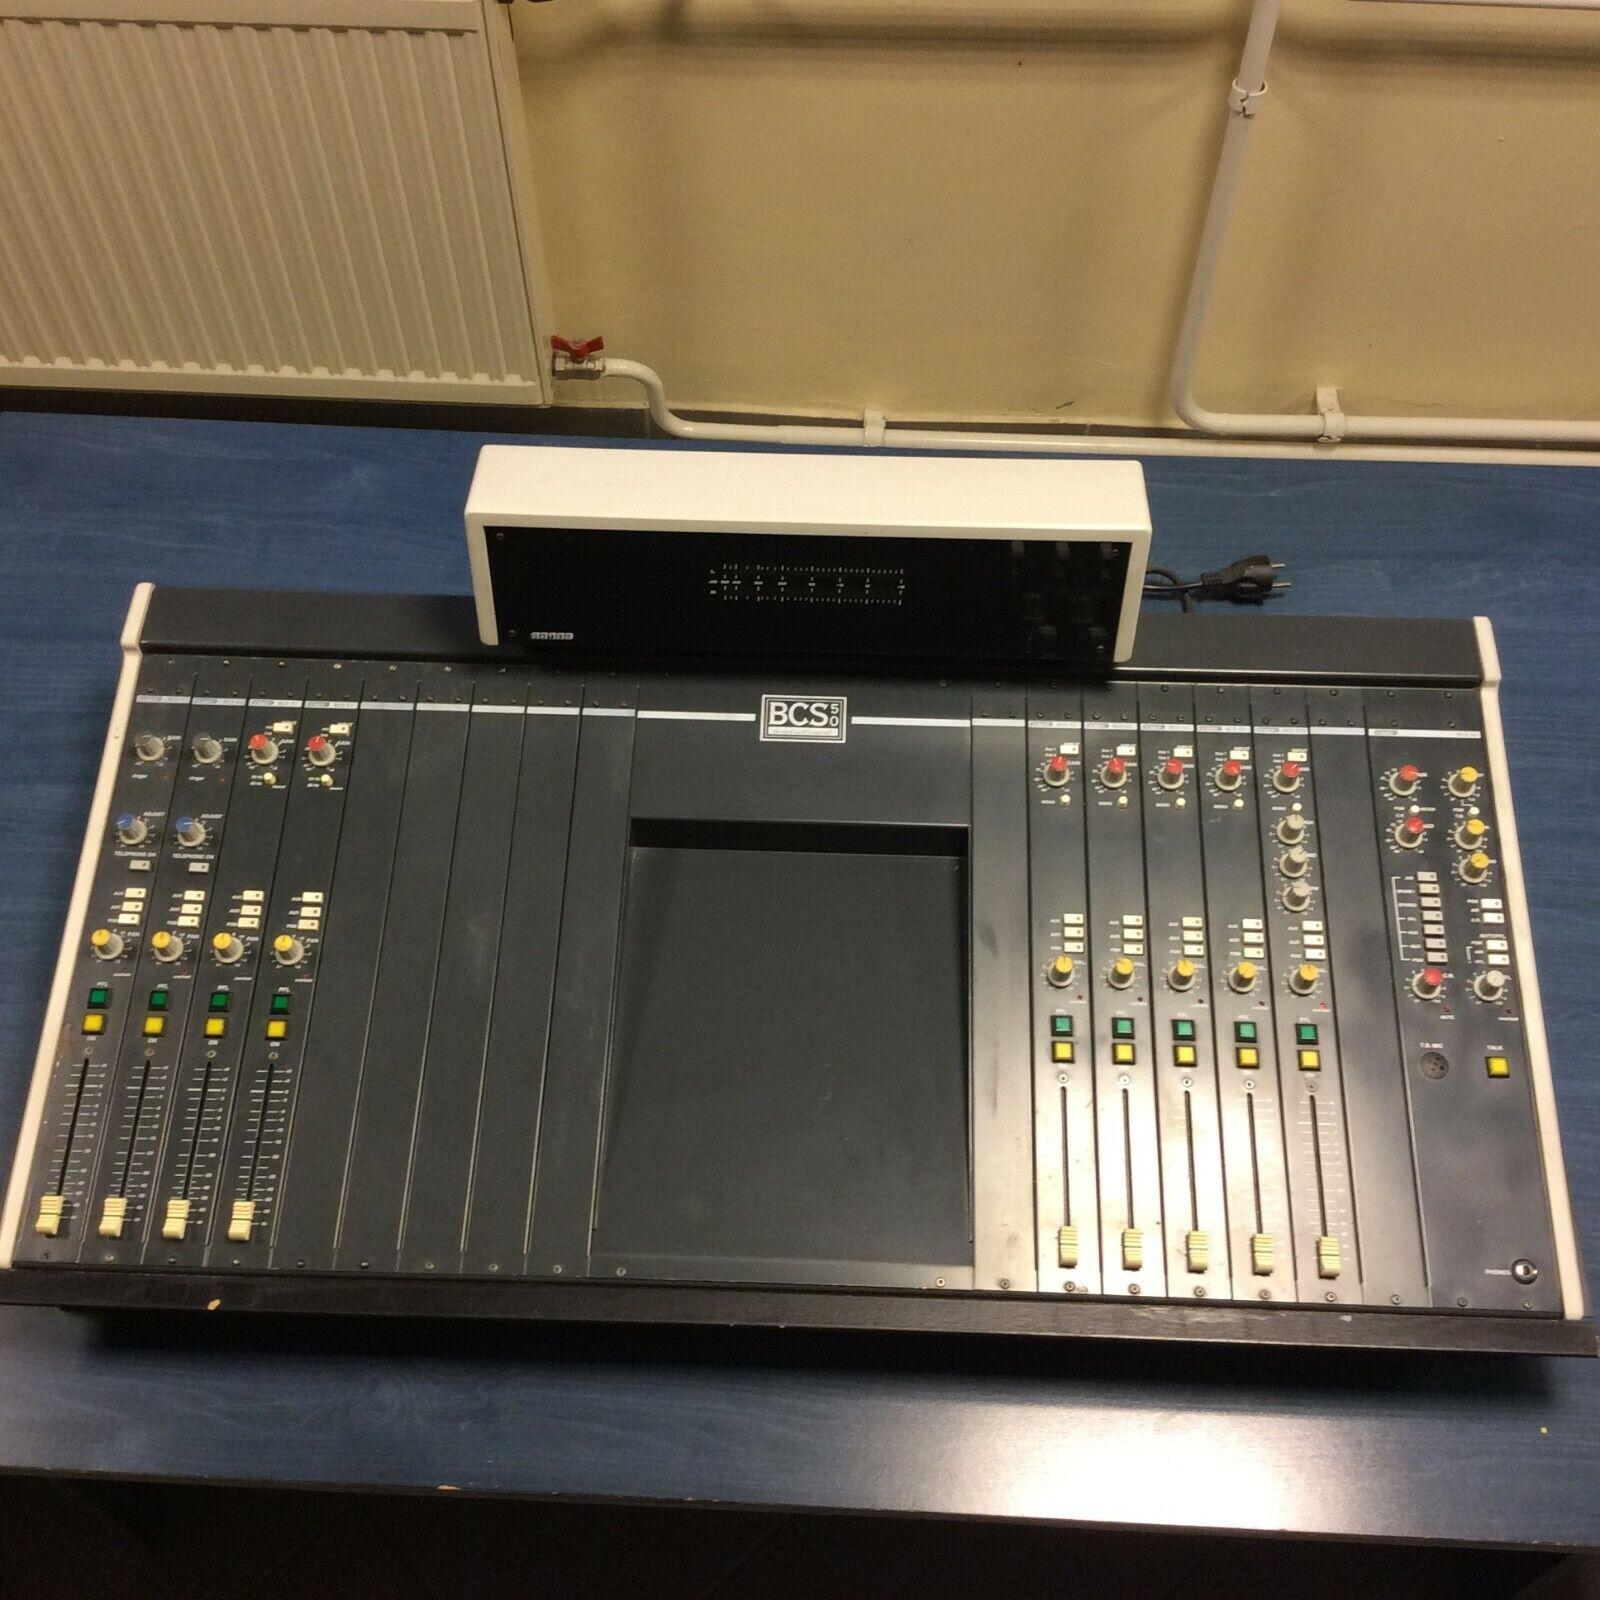 Dateq BCS-50 Broadcast Audio Mixing Desk